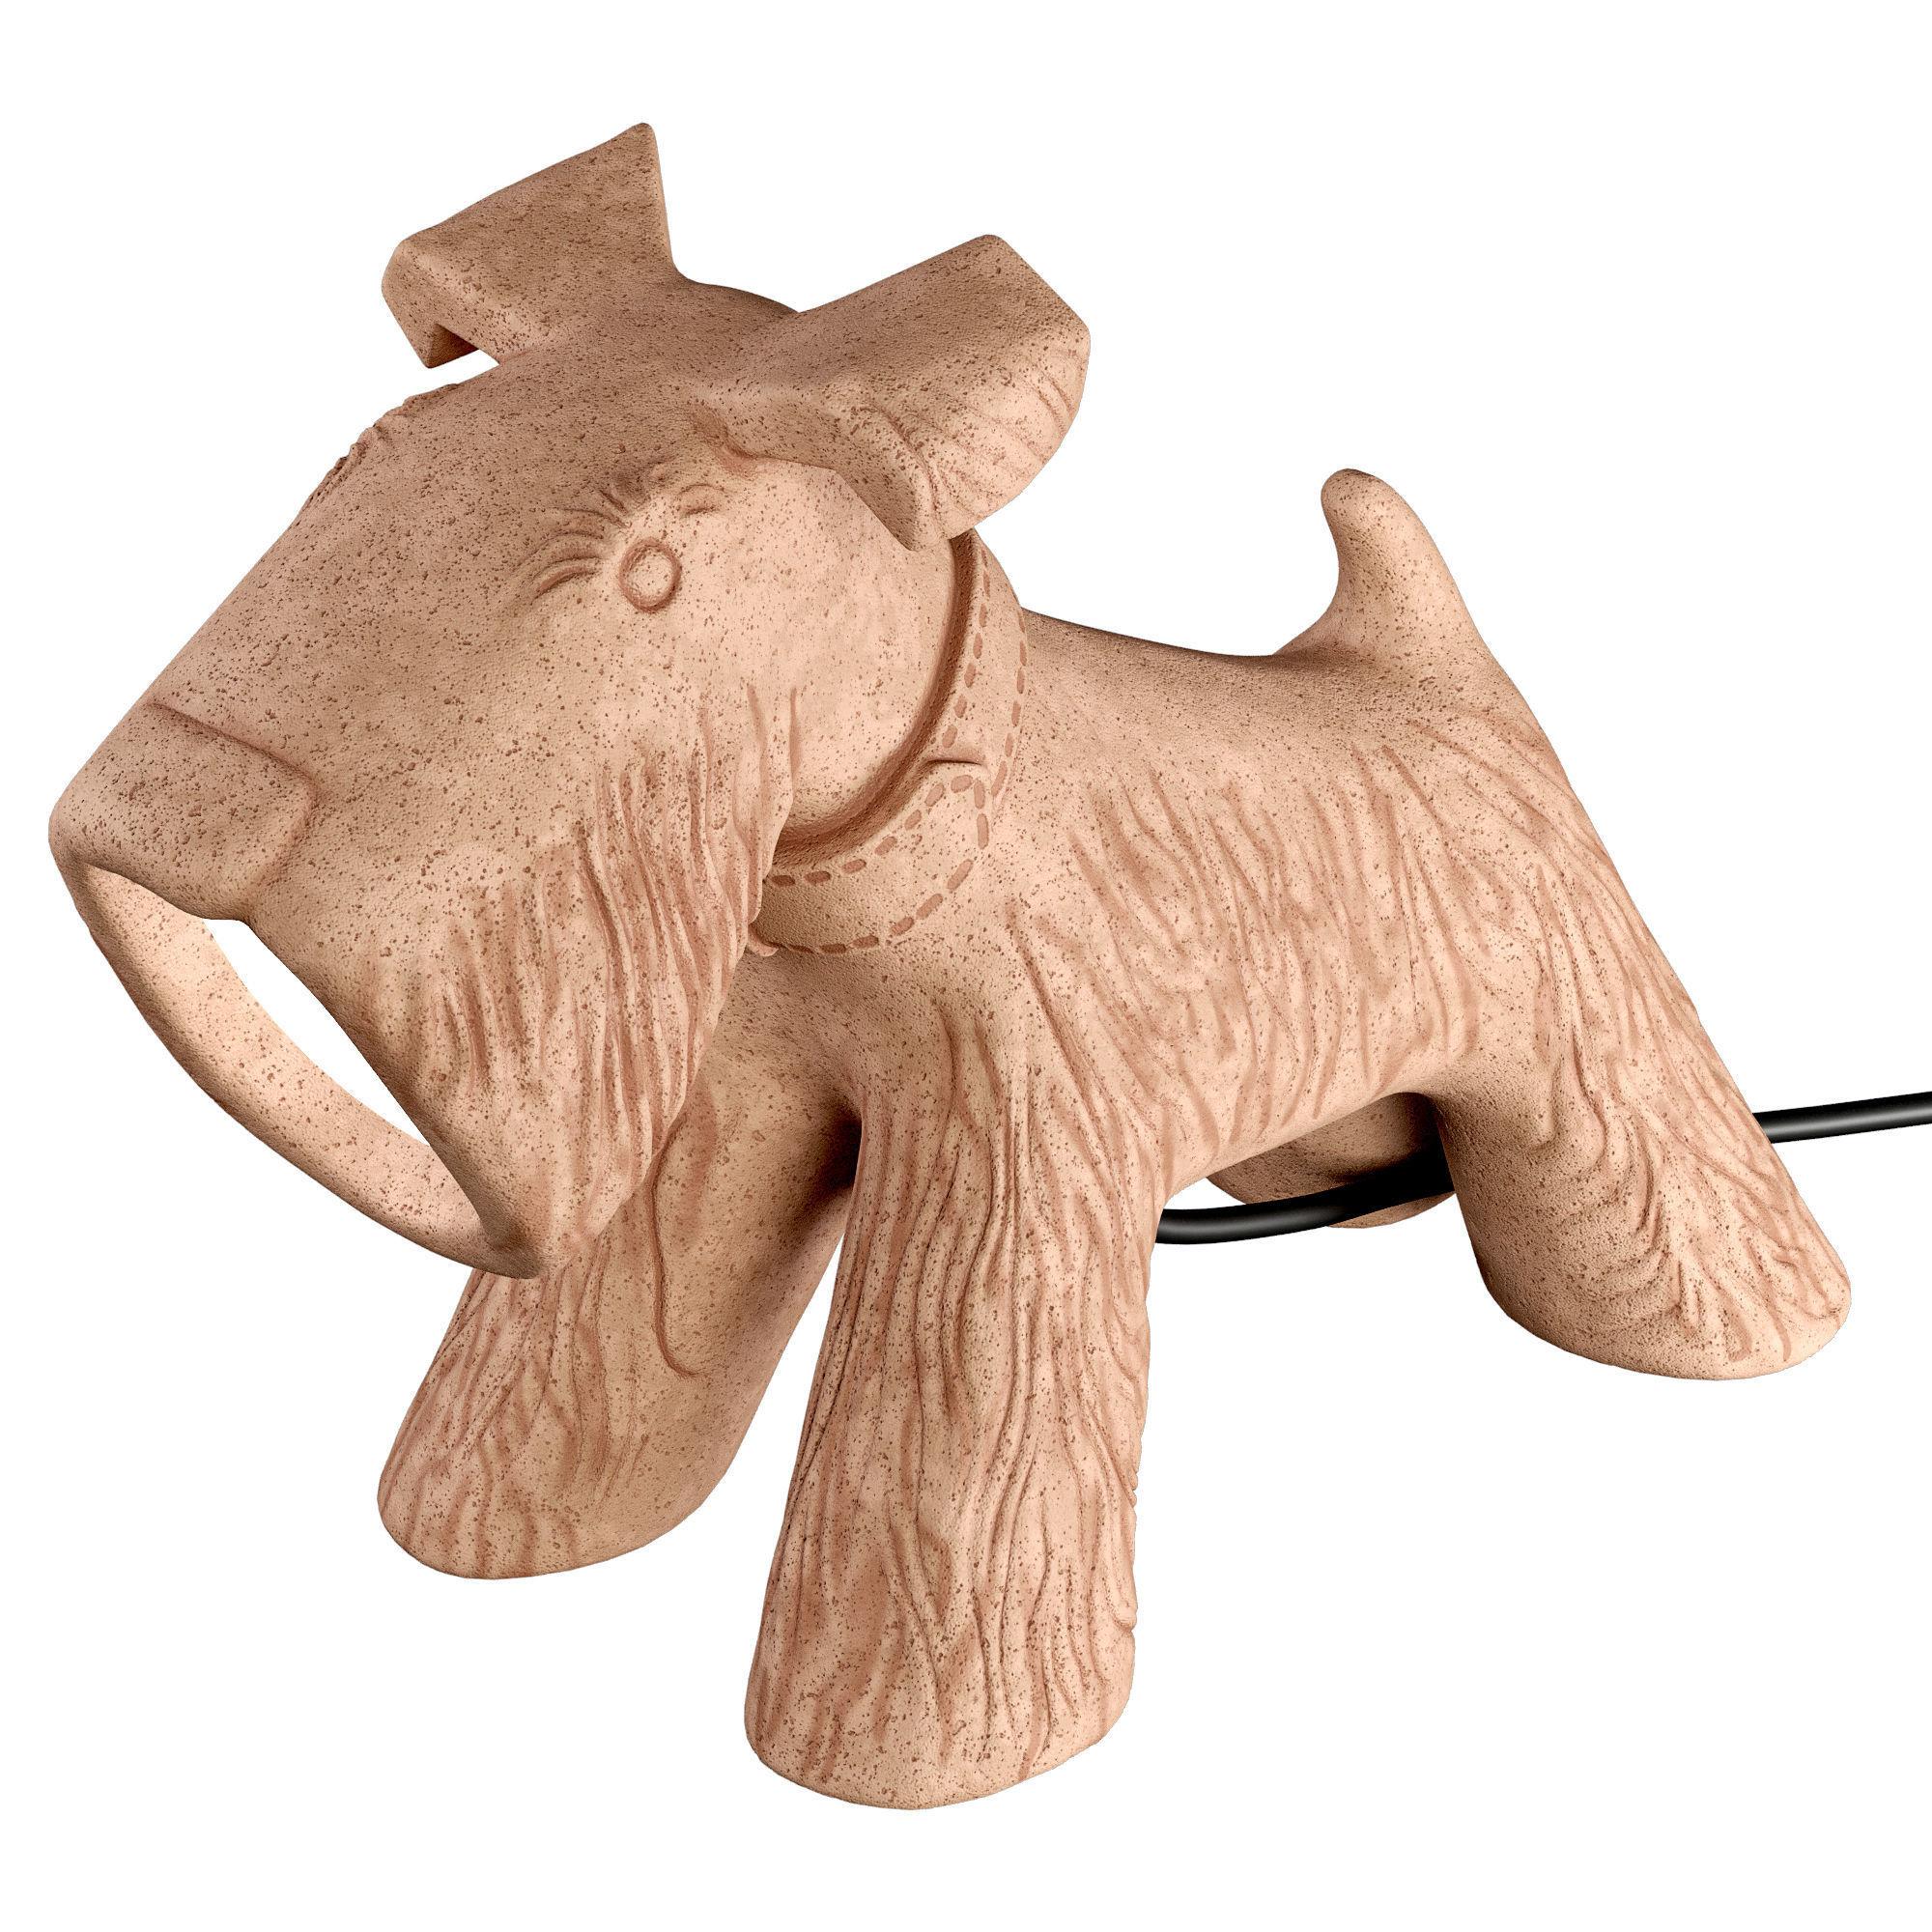 TOSCOT JULE CERAMIC DOGGY GARDEN LAMP